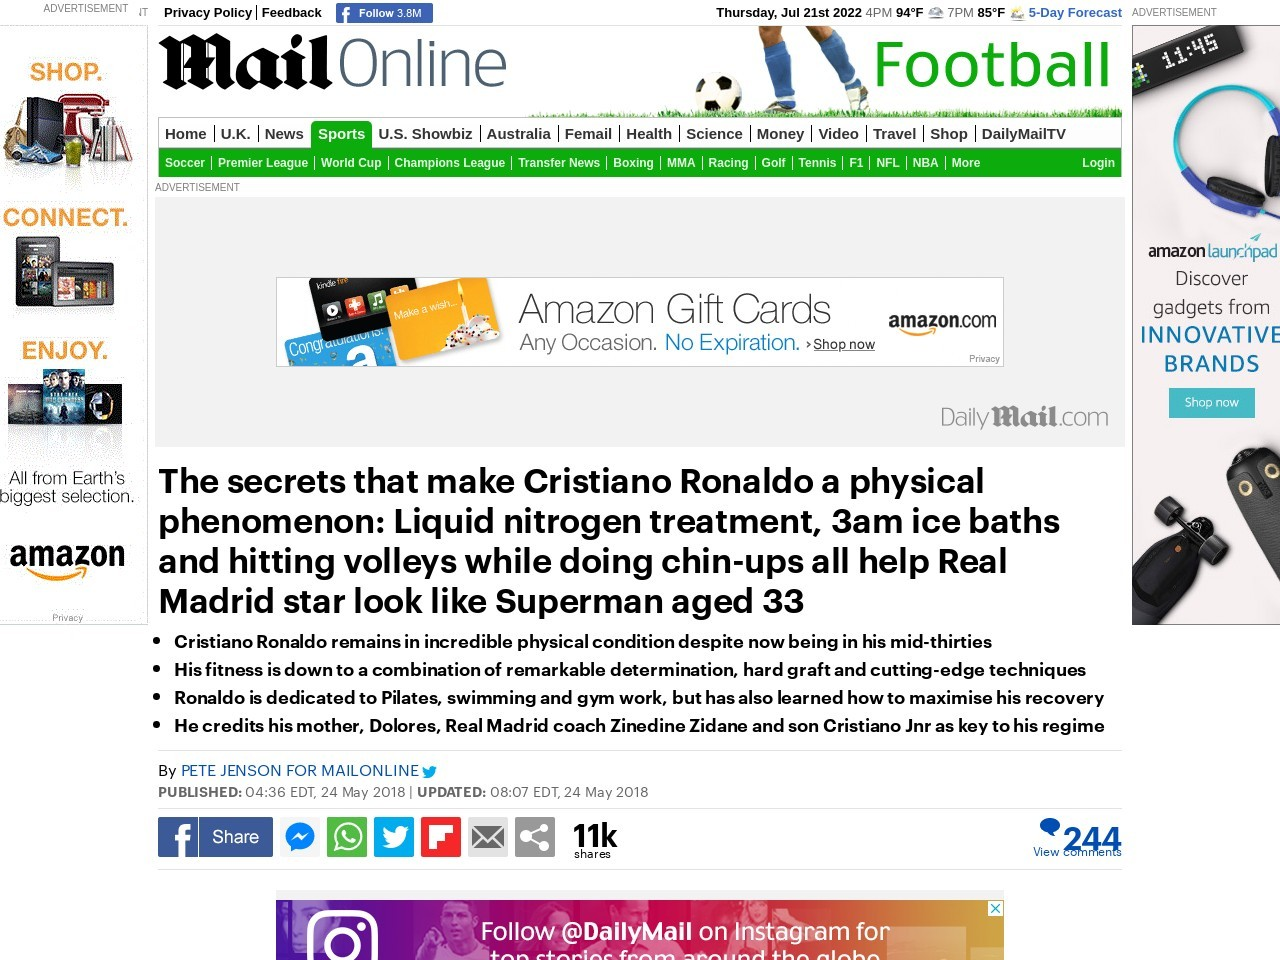 The secrets that make Cristiano Ronaldo a physical phenomenon